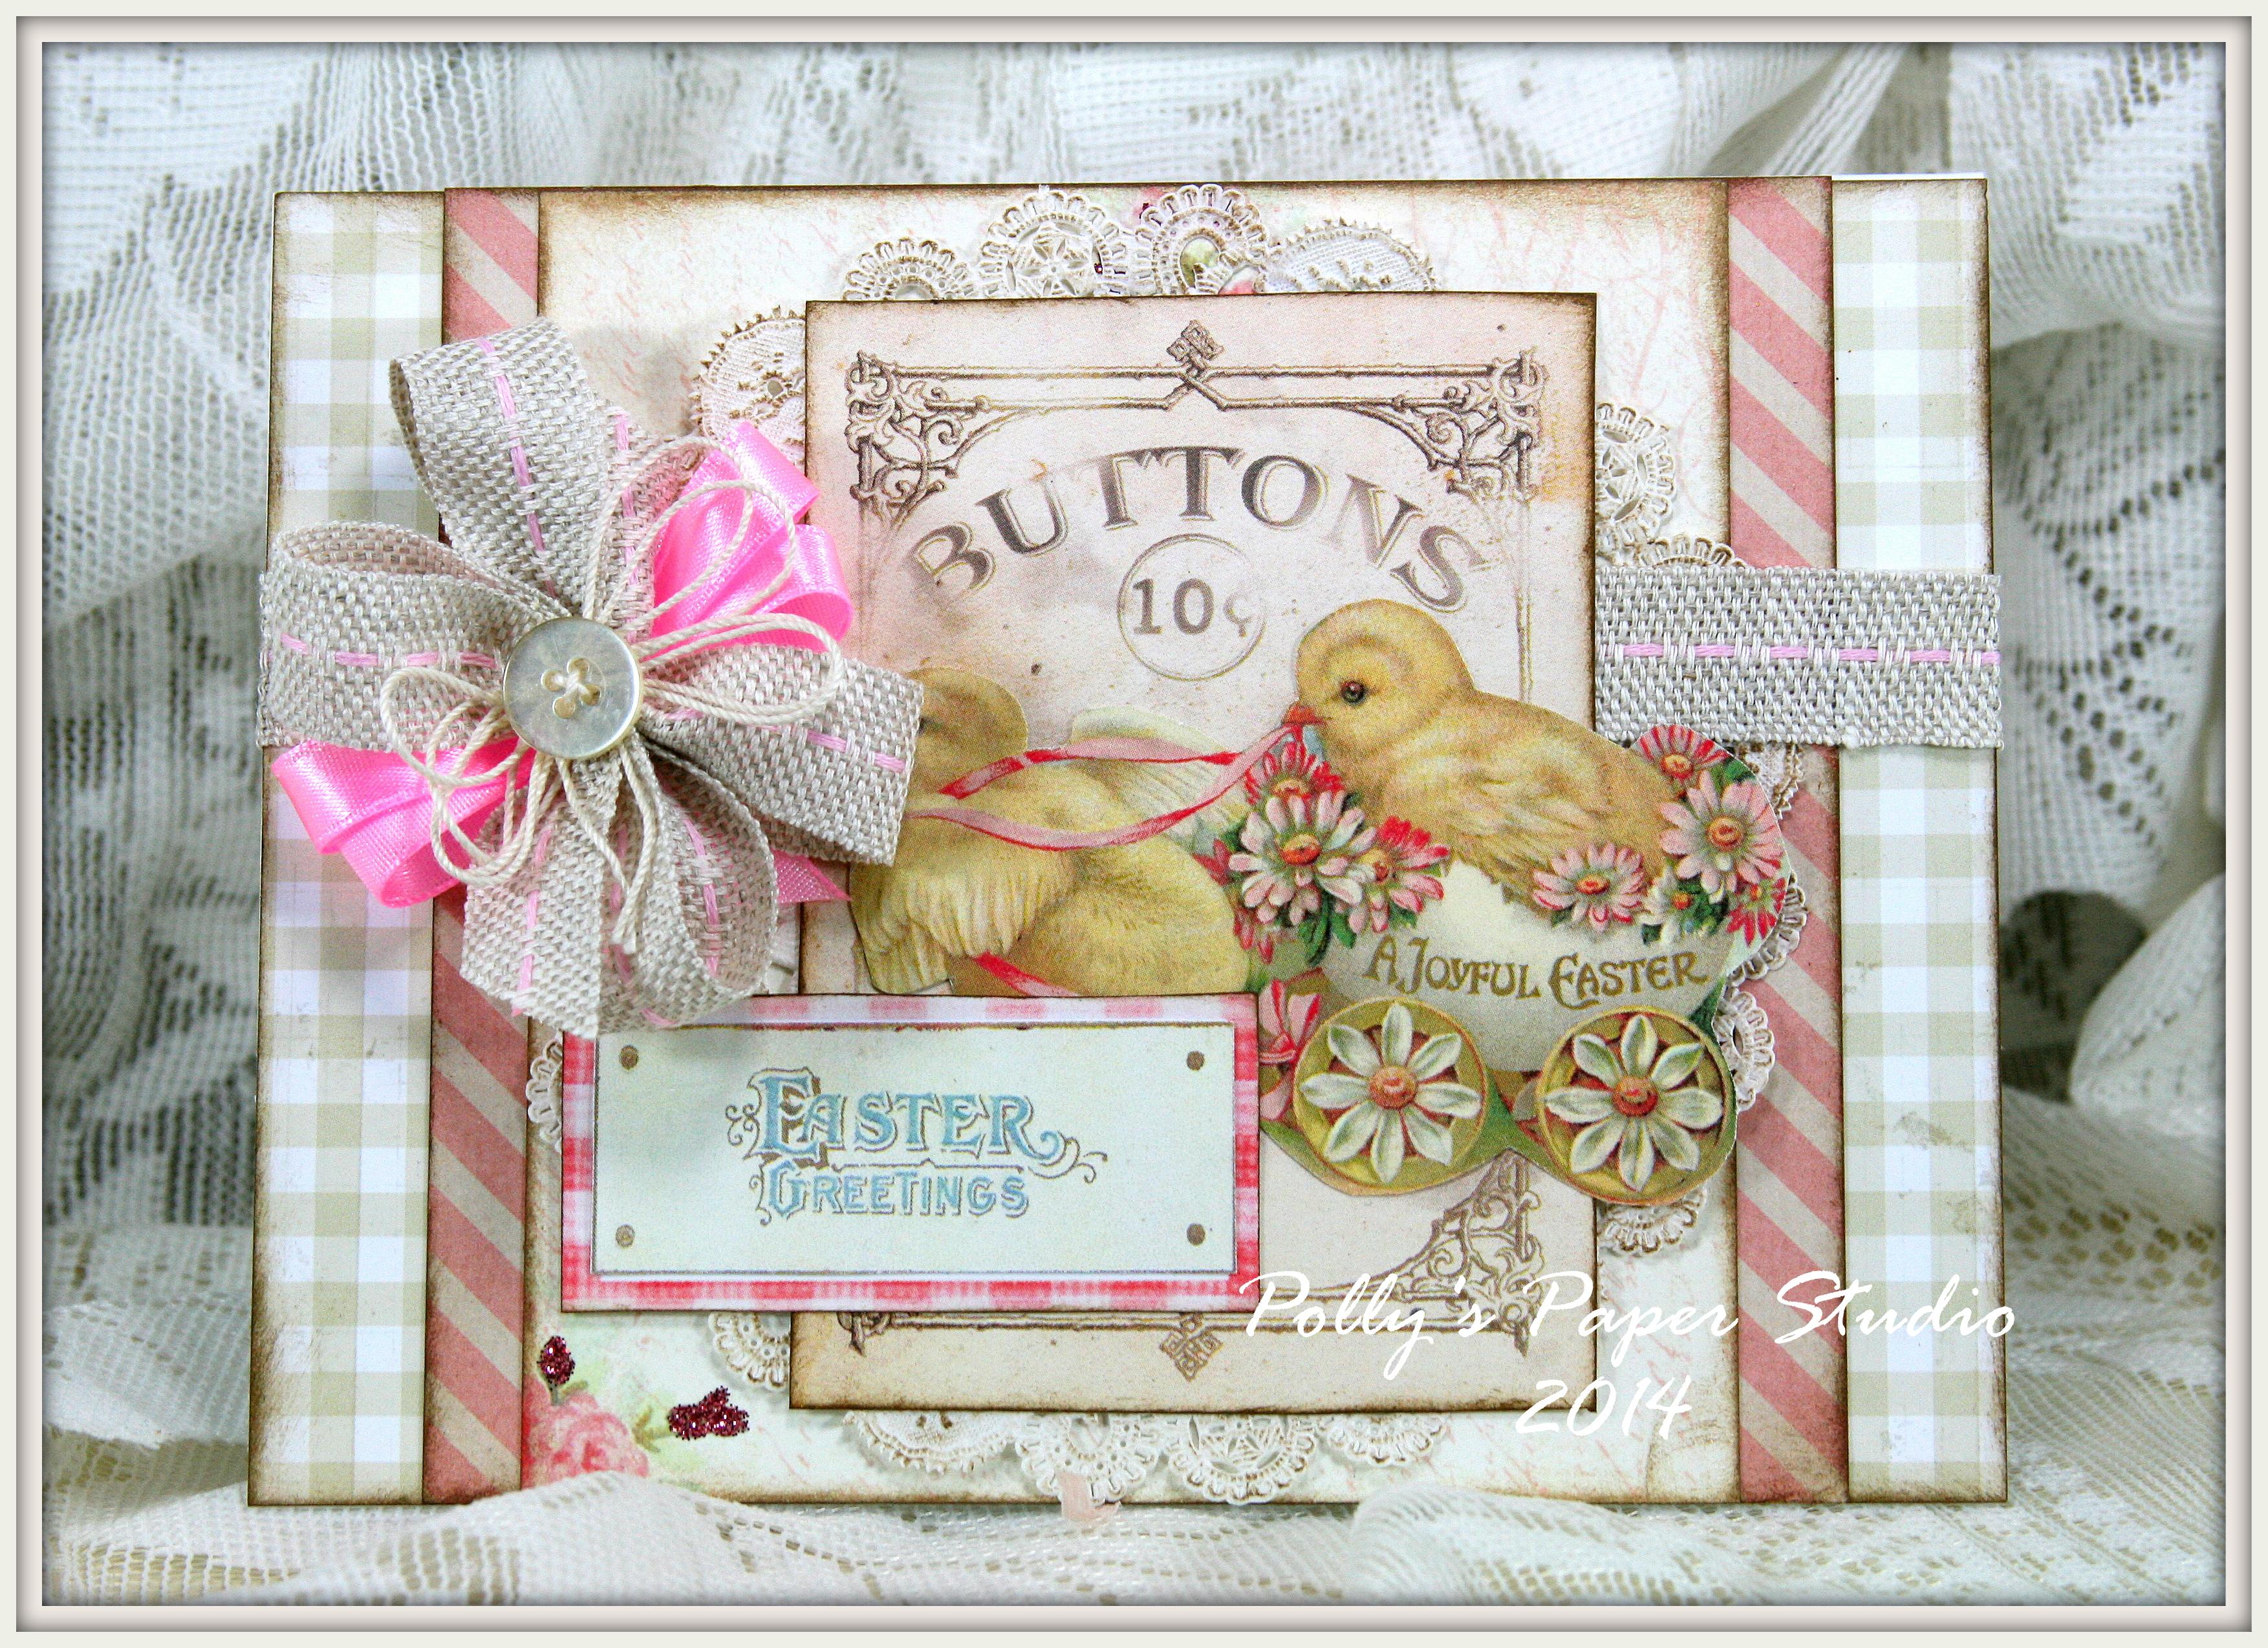 Vintage Easter Cards IMG 2848 2853 2845 2854 2857